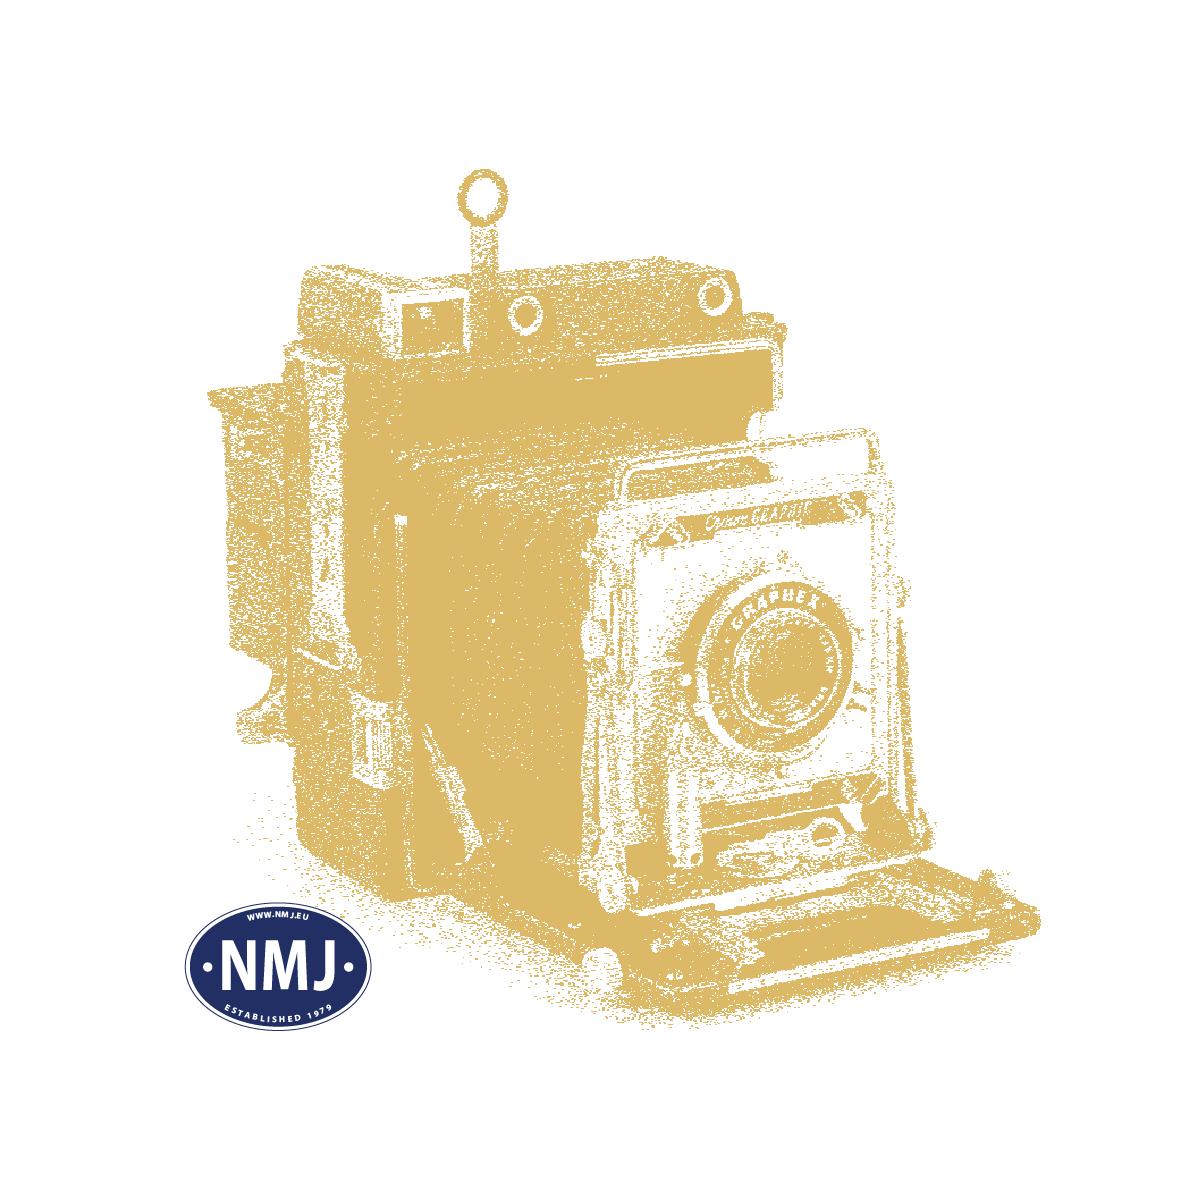 MIG0012 - RAL 7028 Dunkelgelb Aus '44 Dg III, Akrylmaling (17 ml)